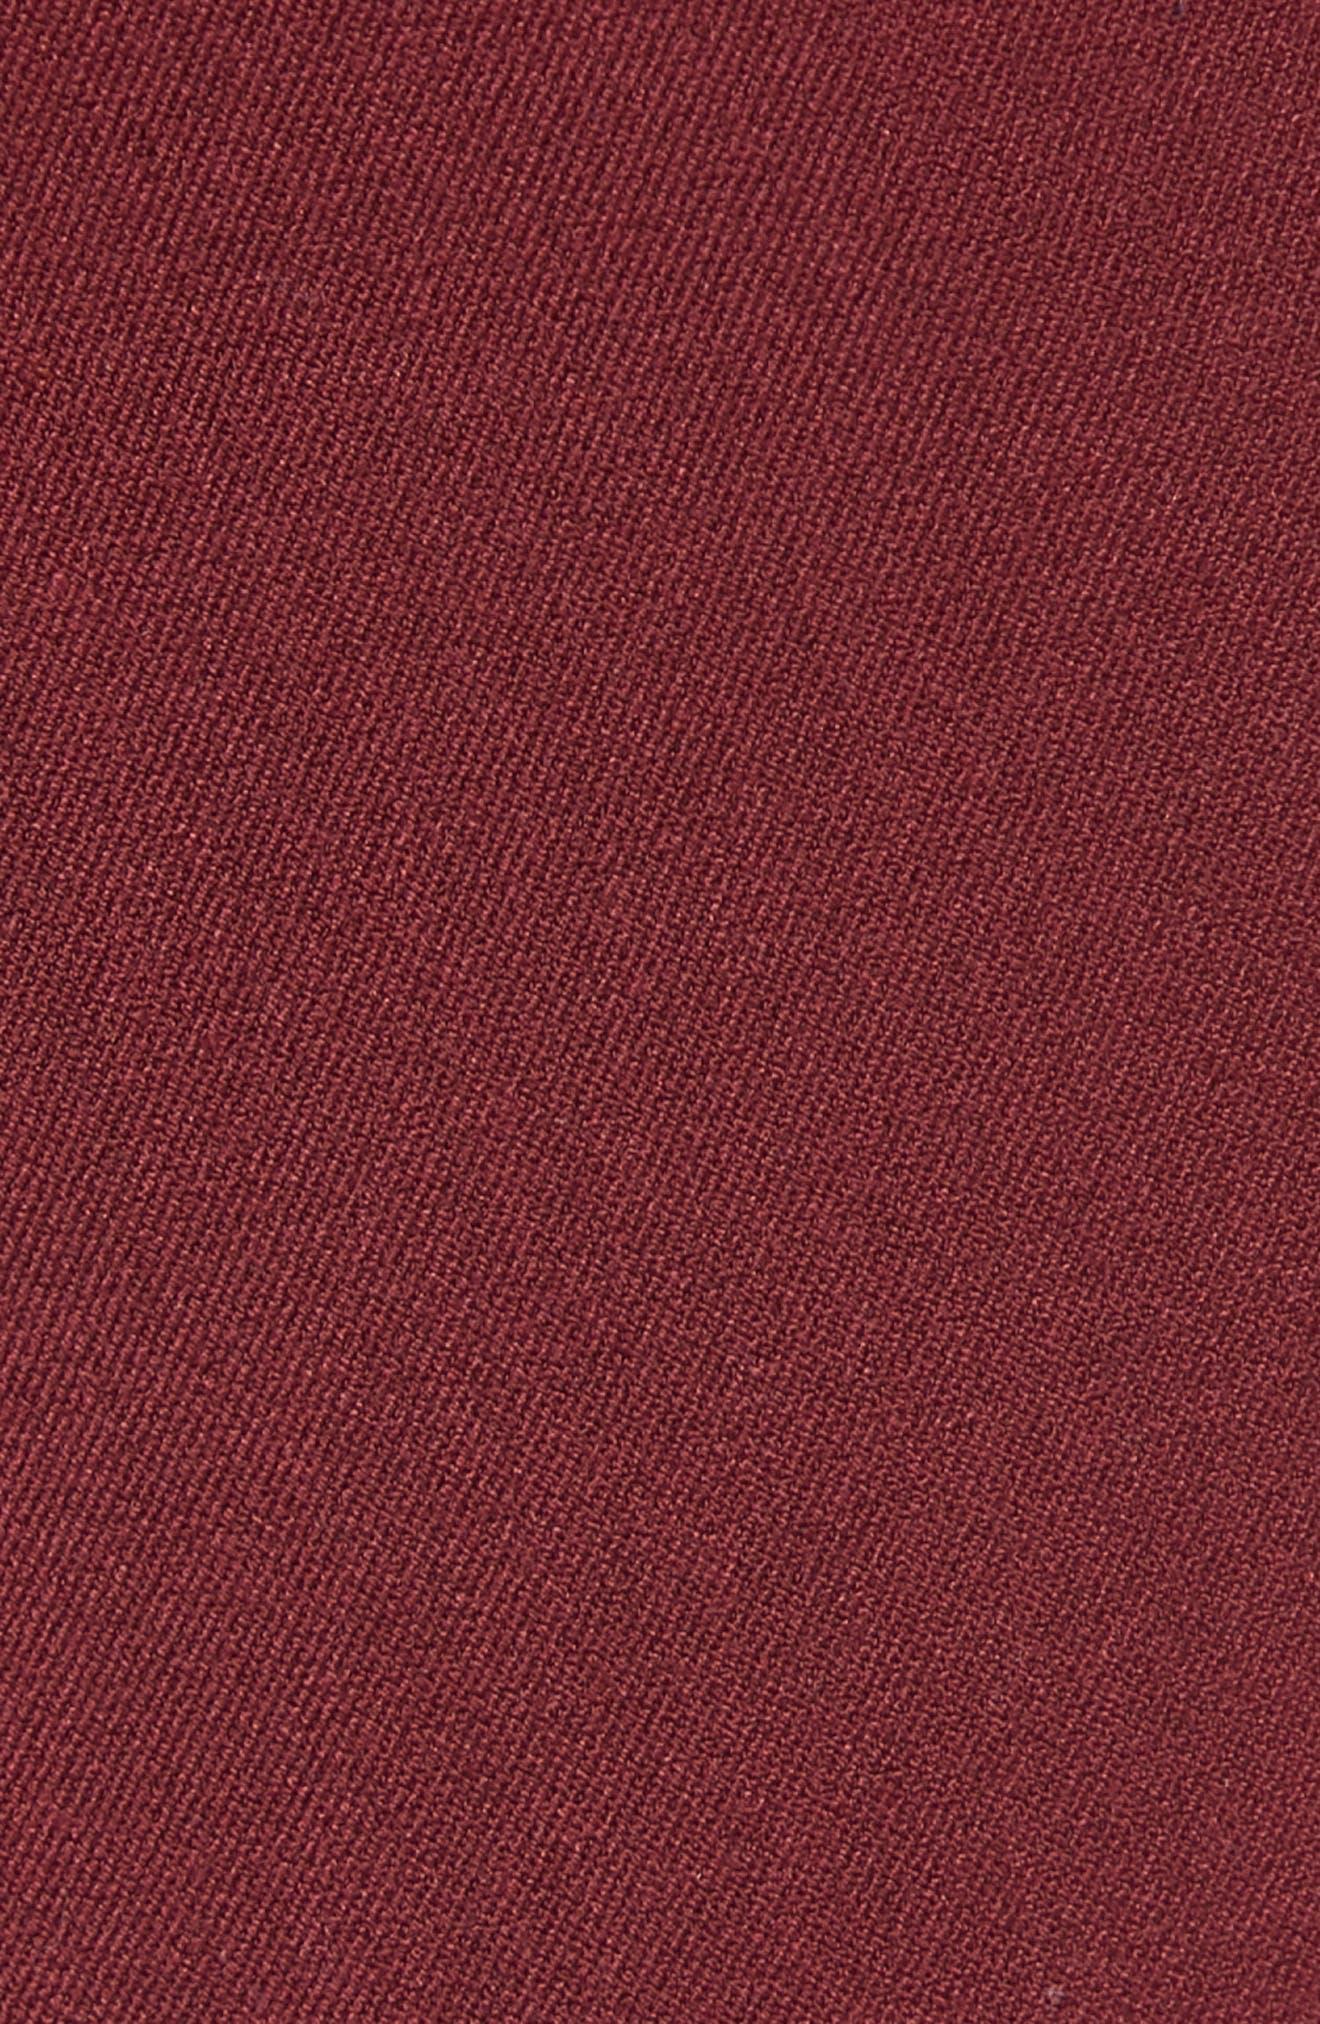 Skinny Fit Trousers,                             Alternate thumbnail 5, color,                             PURPLE